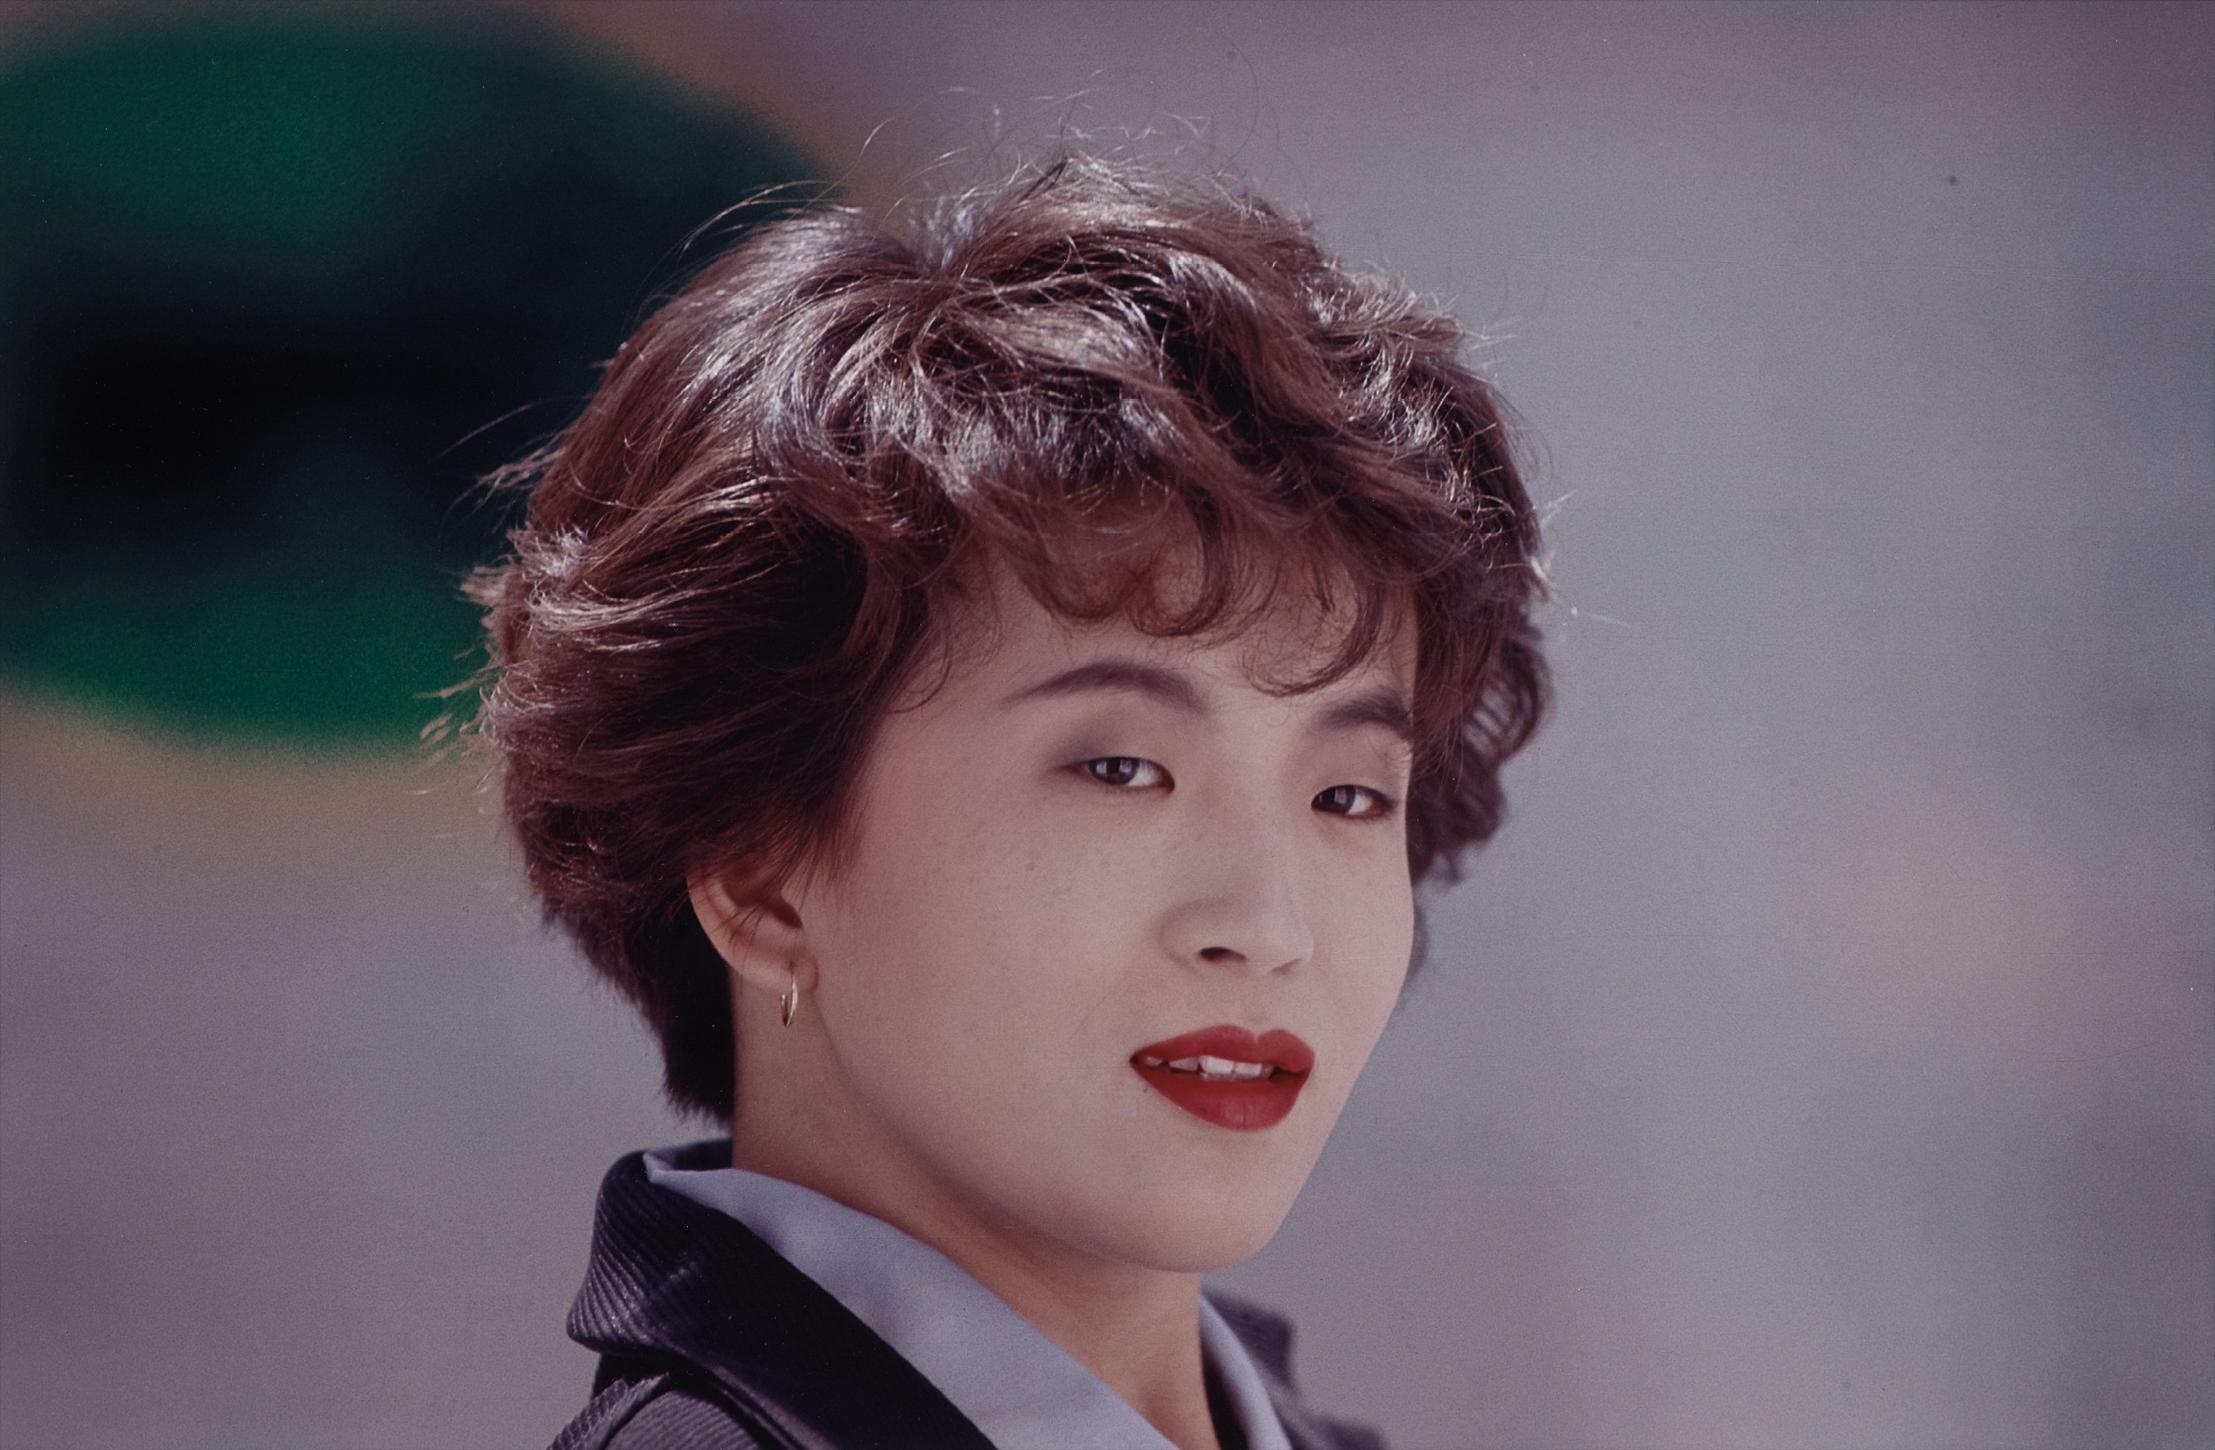 Christopher Williams-Tokuyo Yamada, Hair Designer, Shinbiyo Shuppan Co., Ltd., Minami-Aoyama, Tokyo, April 14, 1993 (R)-1997